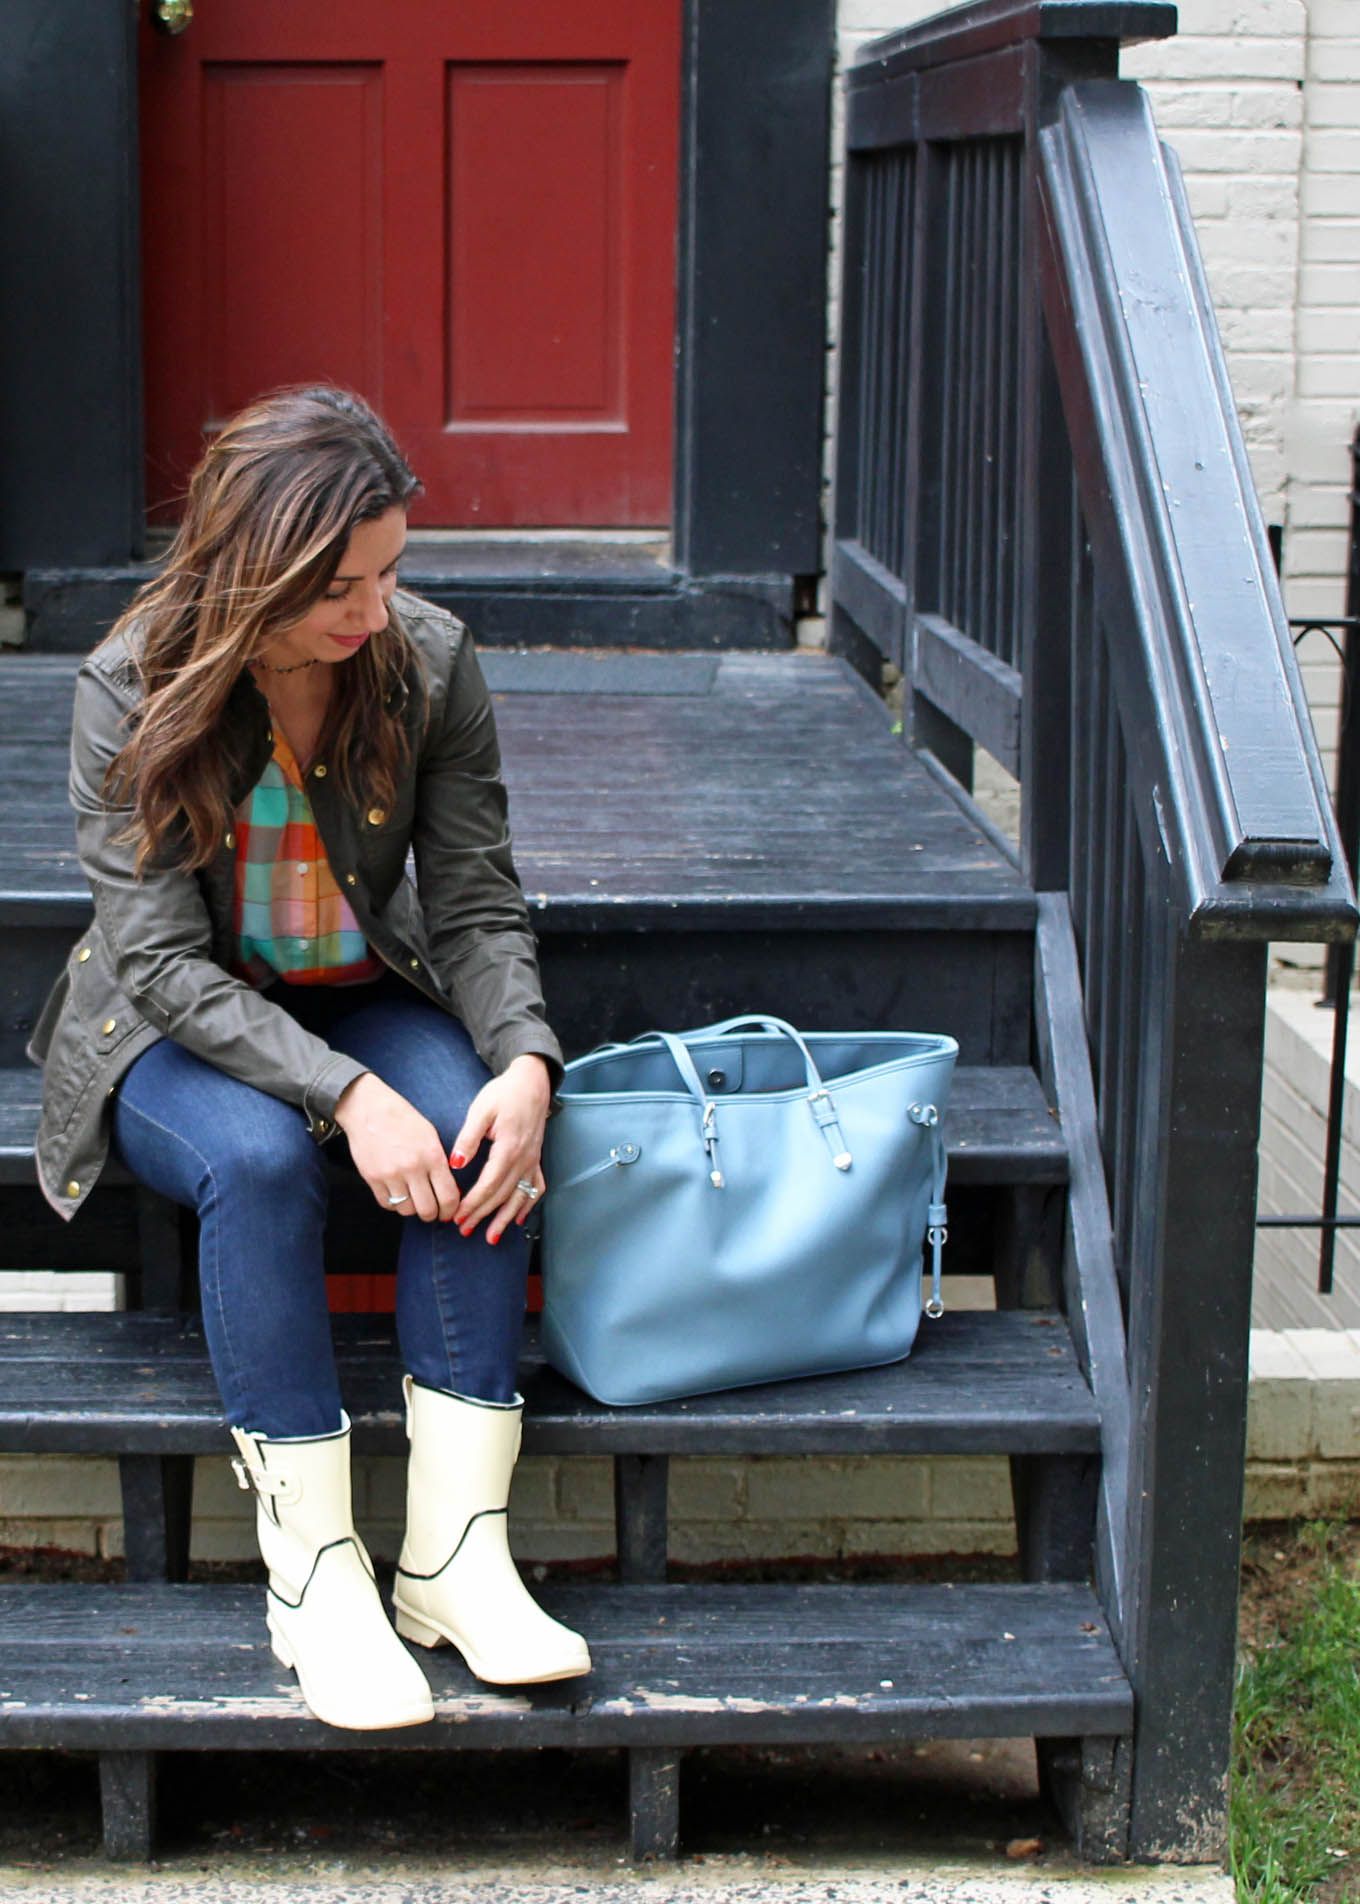 Lifestyle blogger Roxanne of Glass of Glam wearing white Chooka rain boots